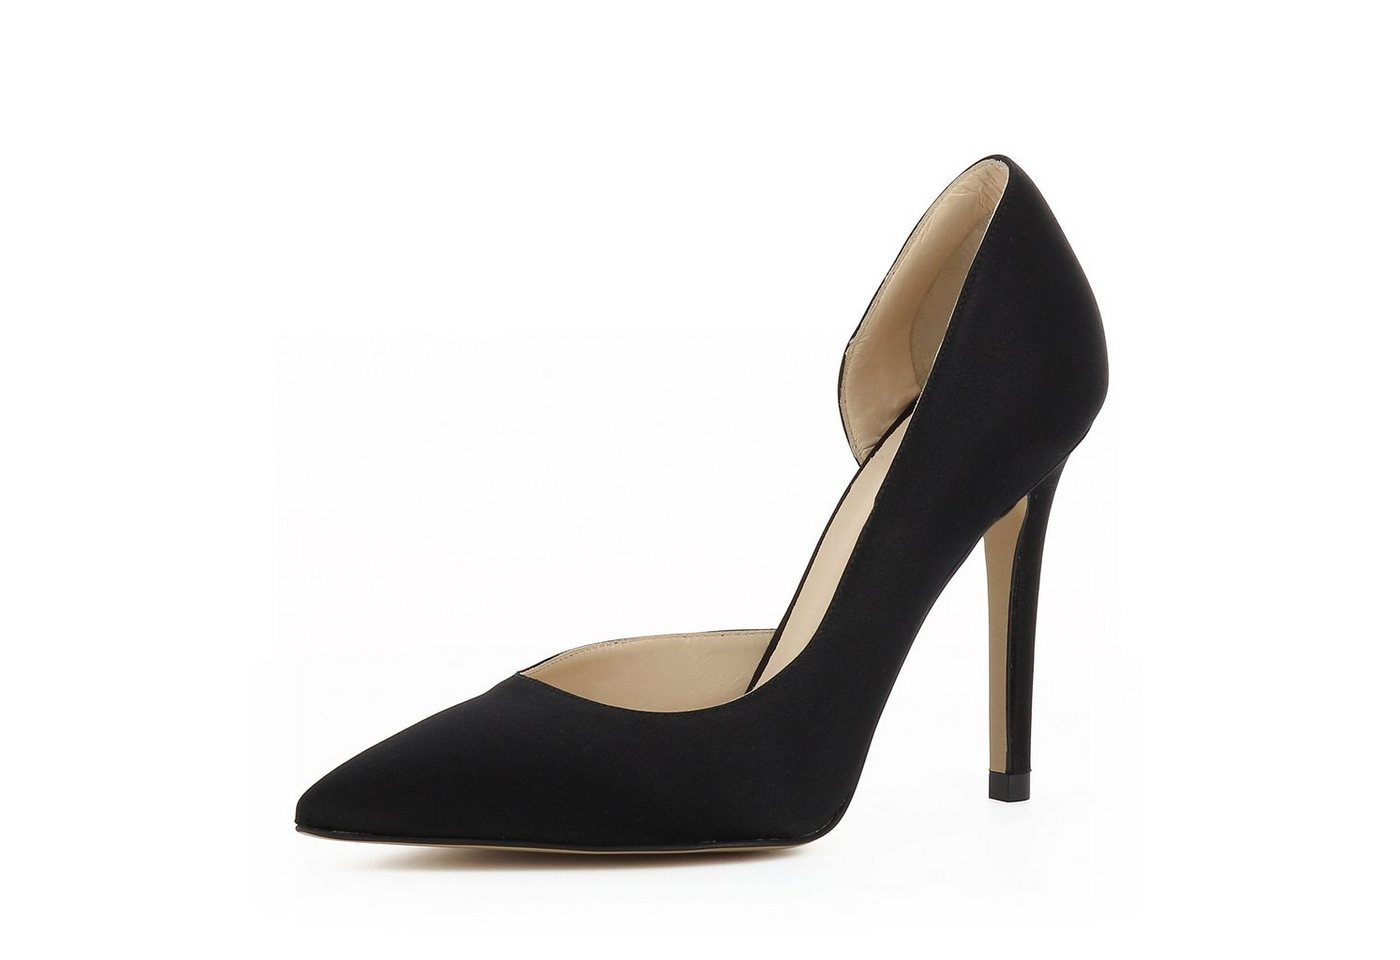 Evita »ALINA« High-Heel-Pumps   Schuhe > High Heels > High Heel Pumps   Schwarz   Evita